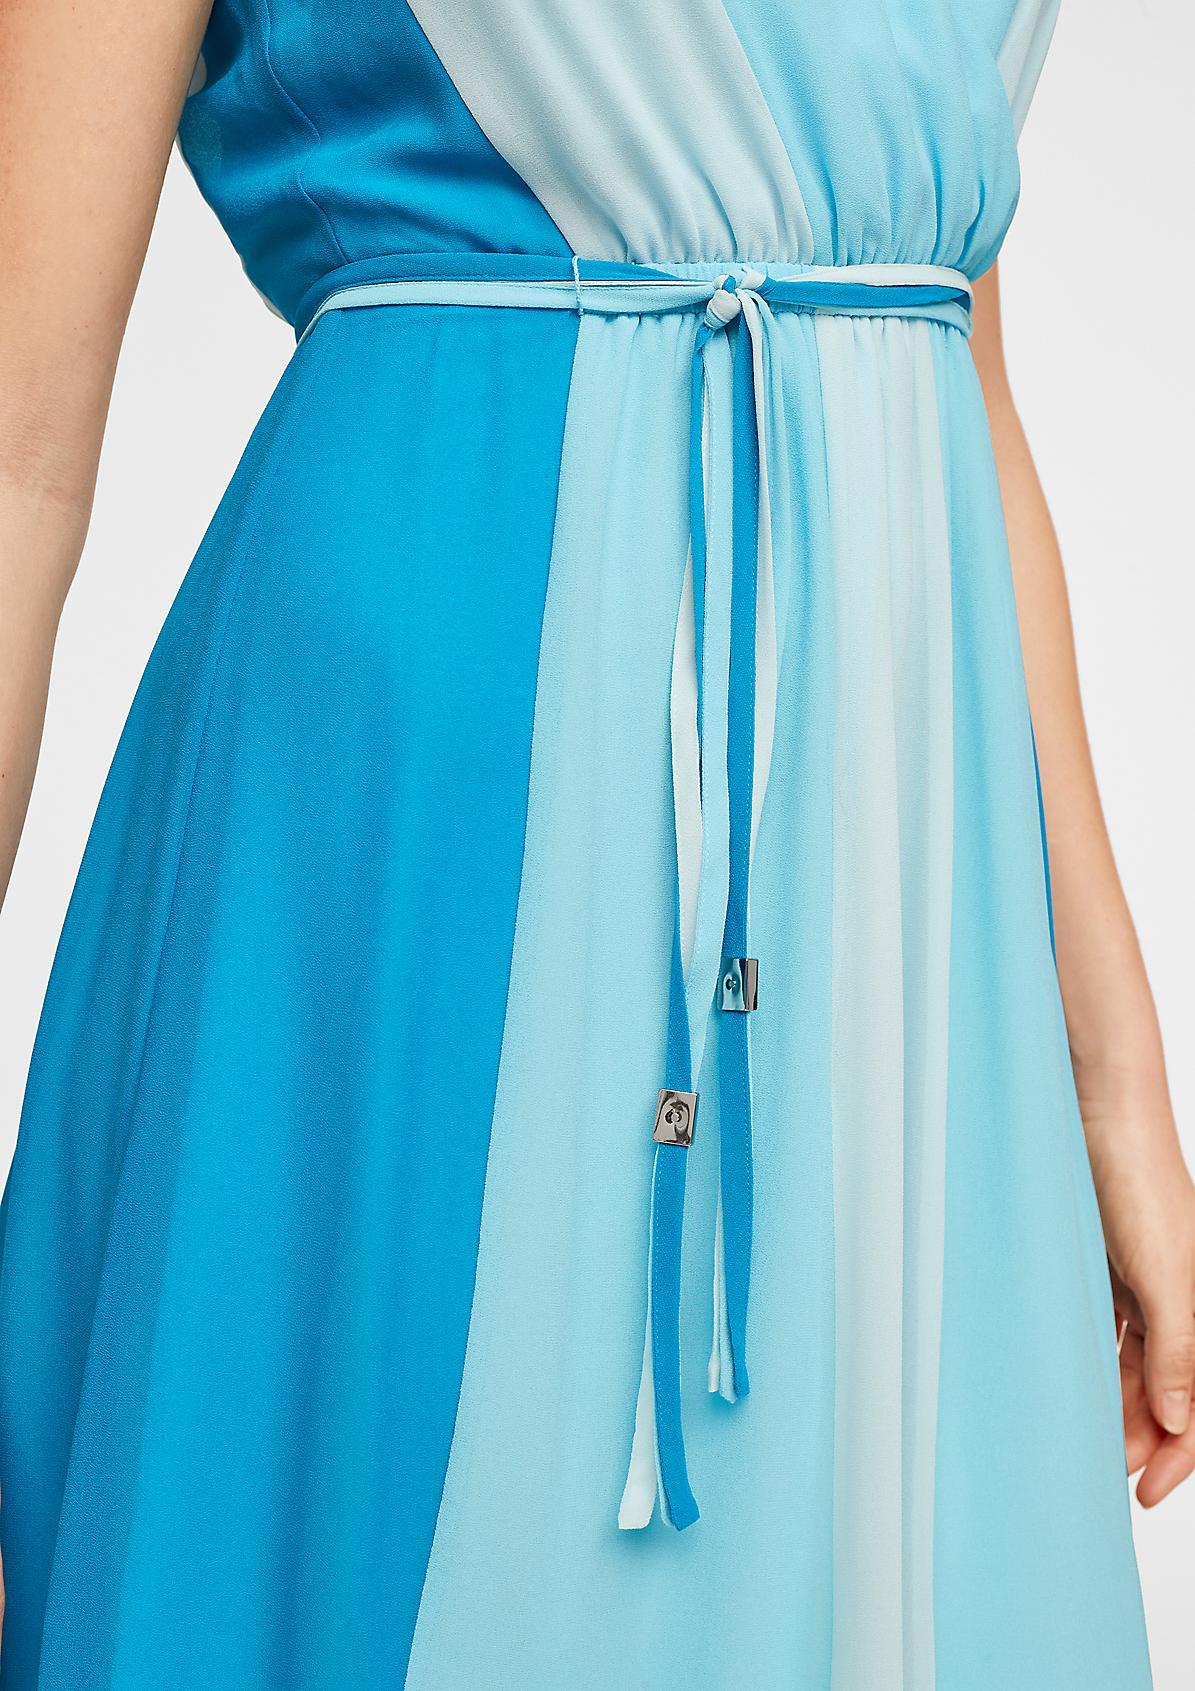 V-Neck-Kleid mit Farbverlauf